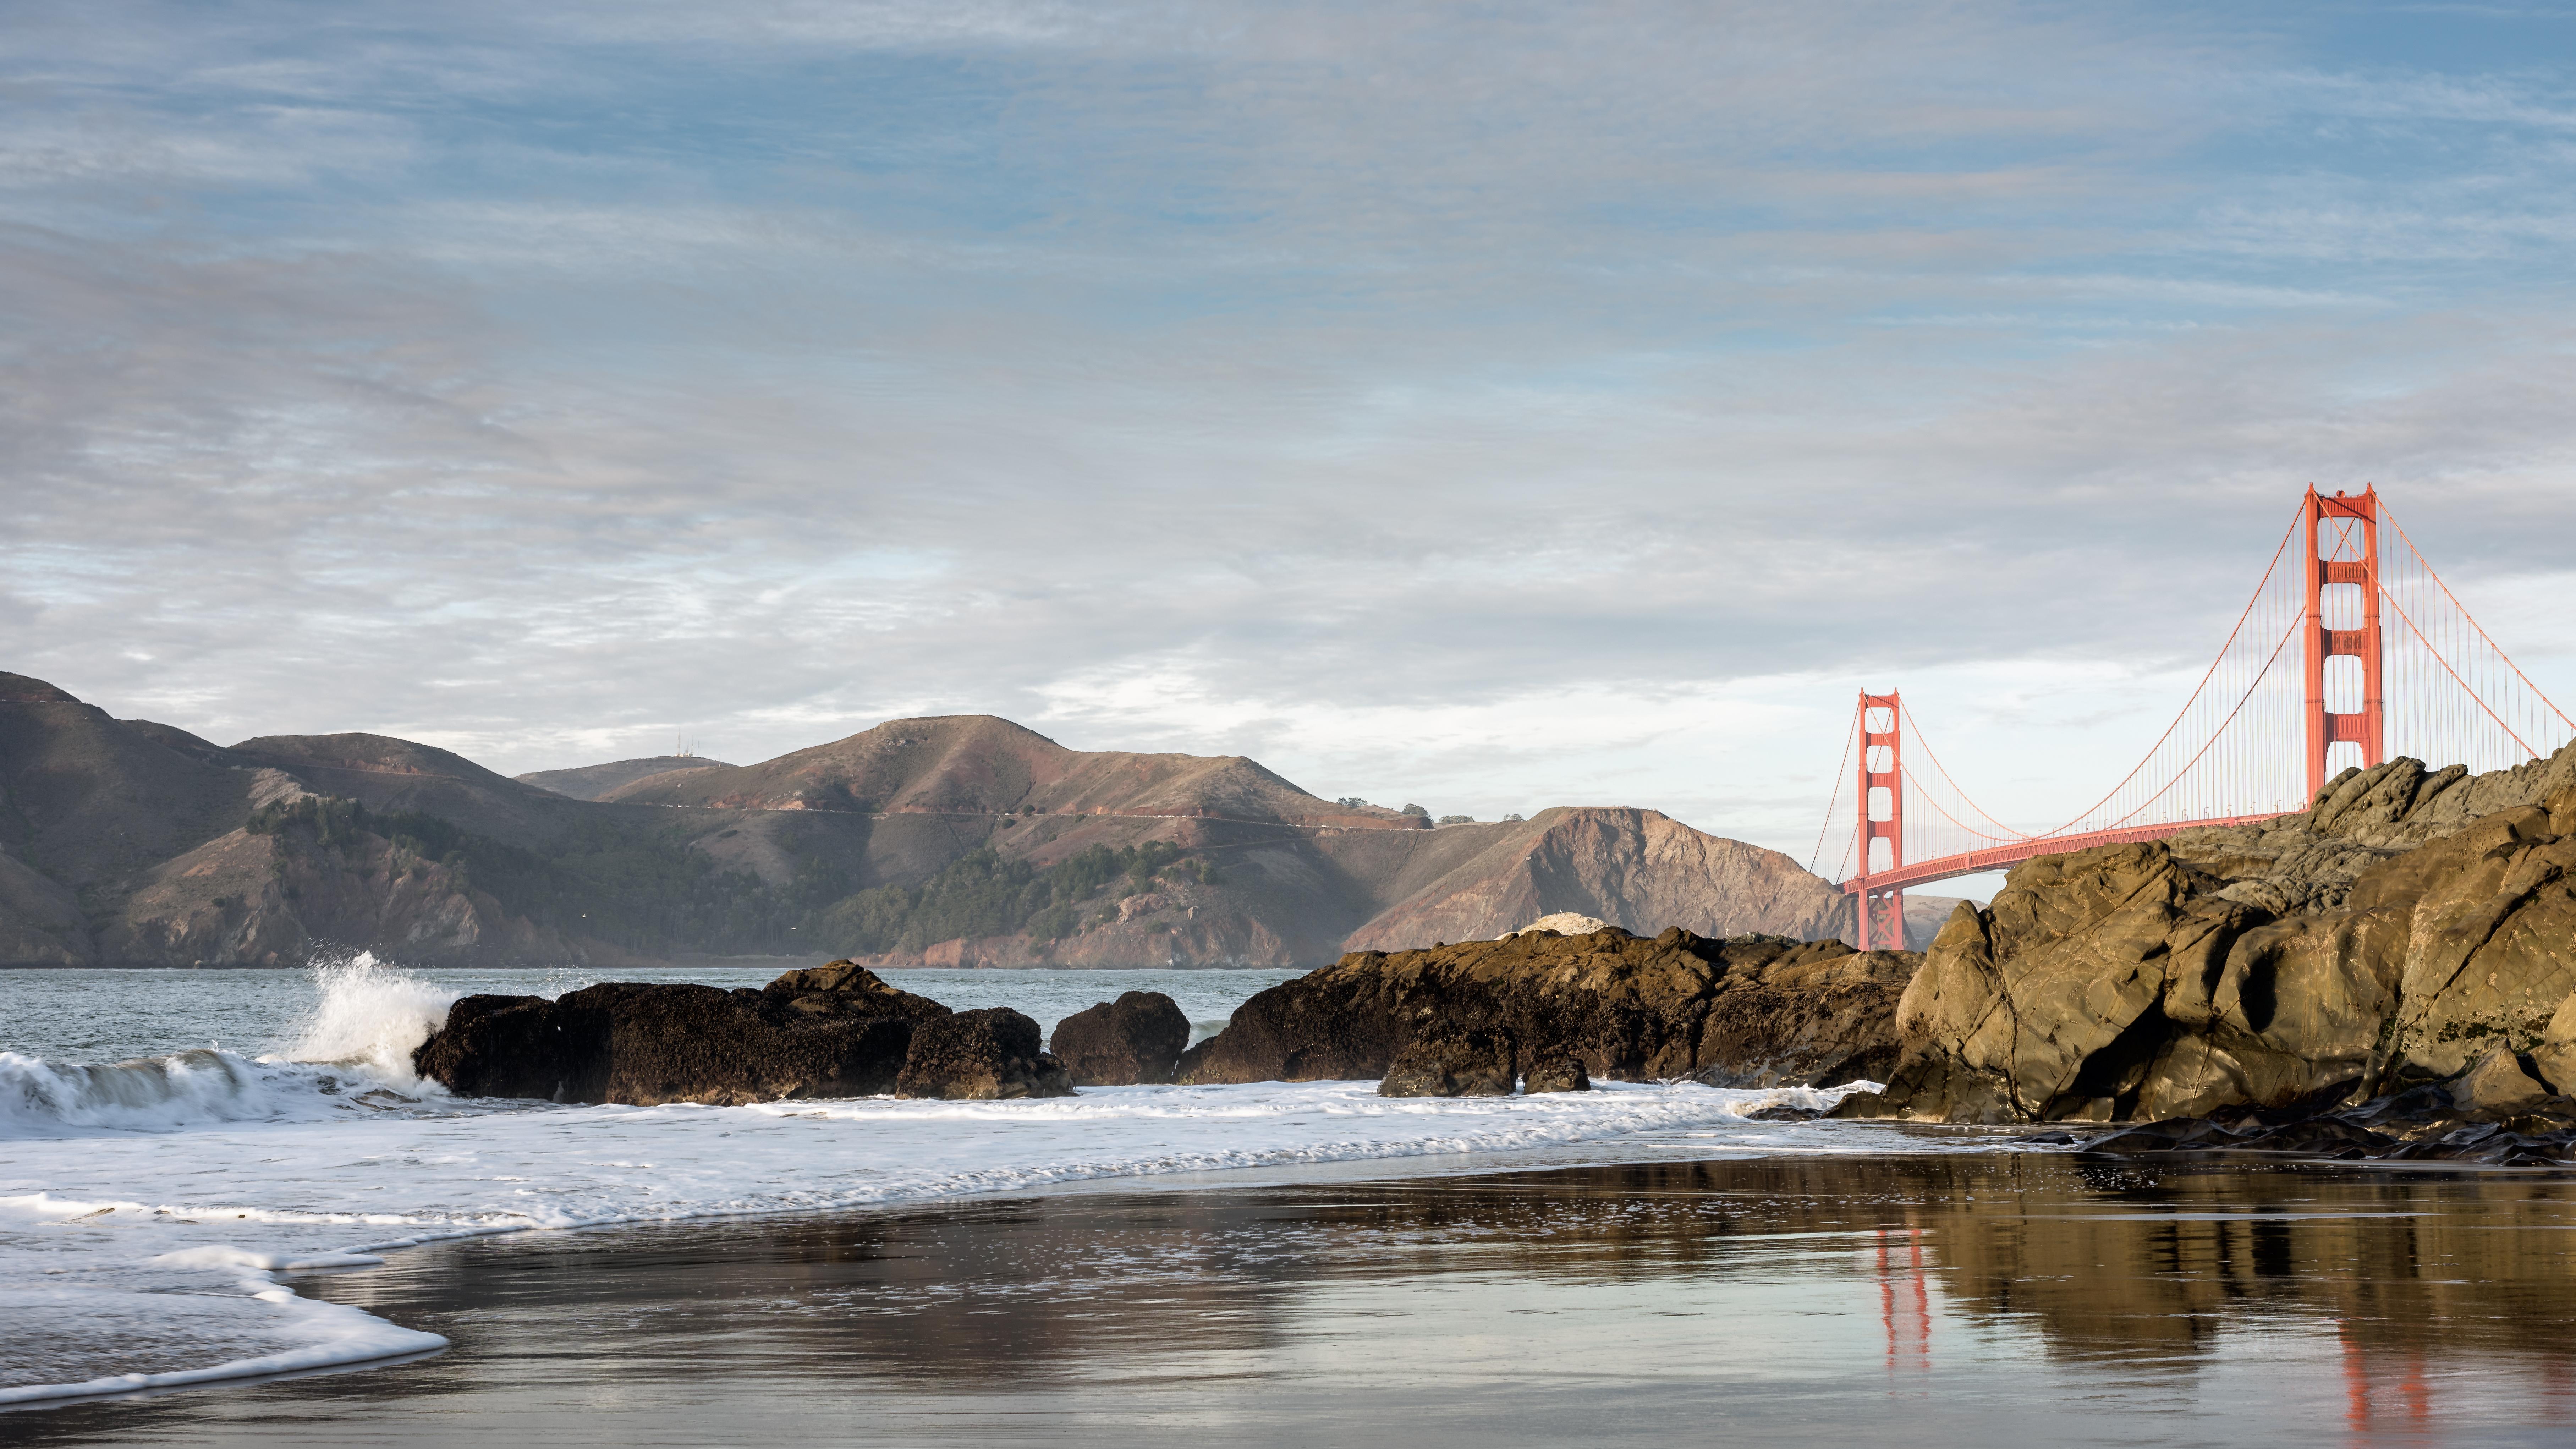 San Francisco Golden Gate Bridge from Baker Beach